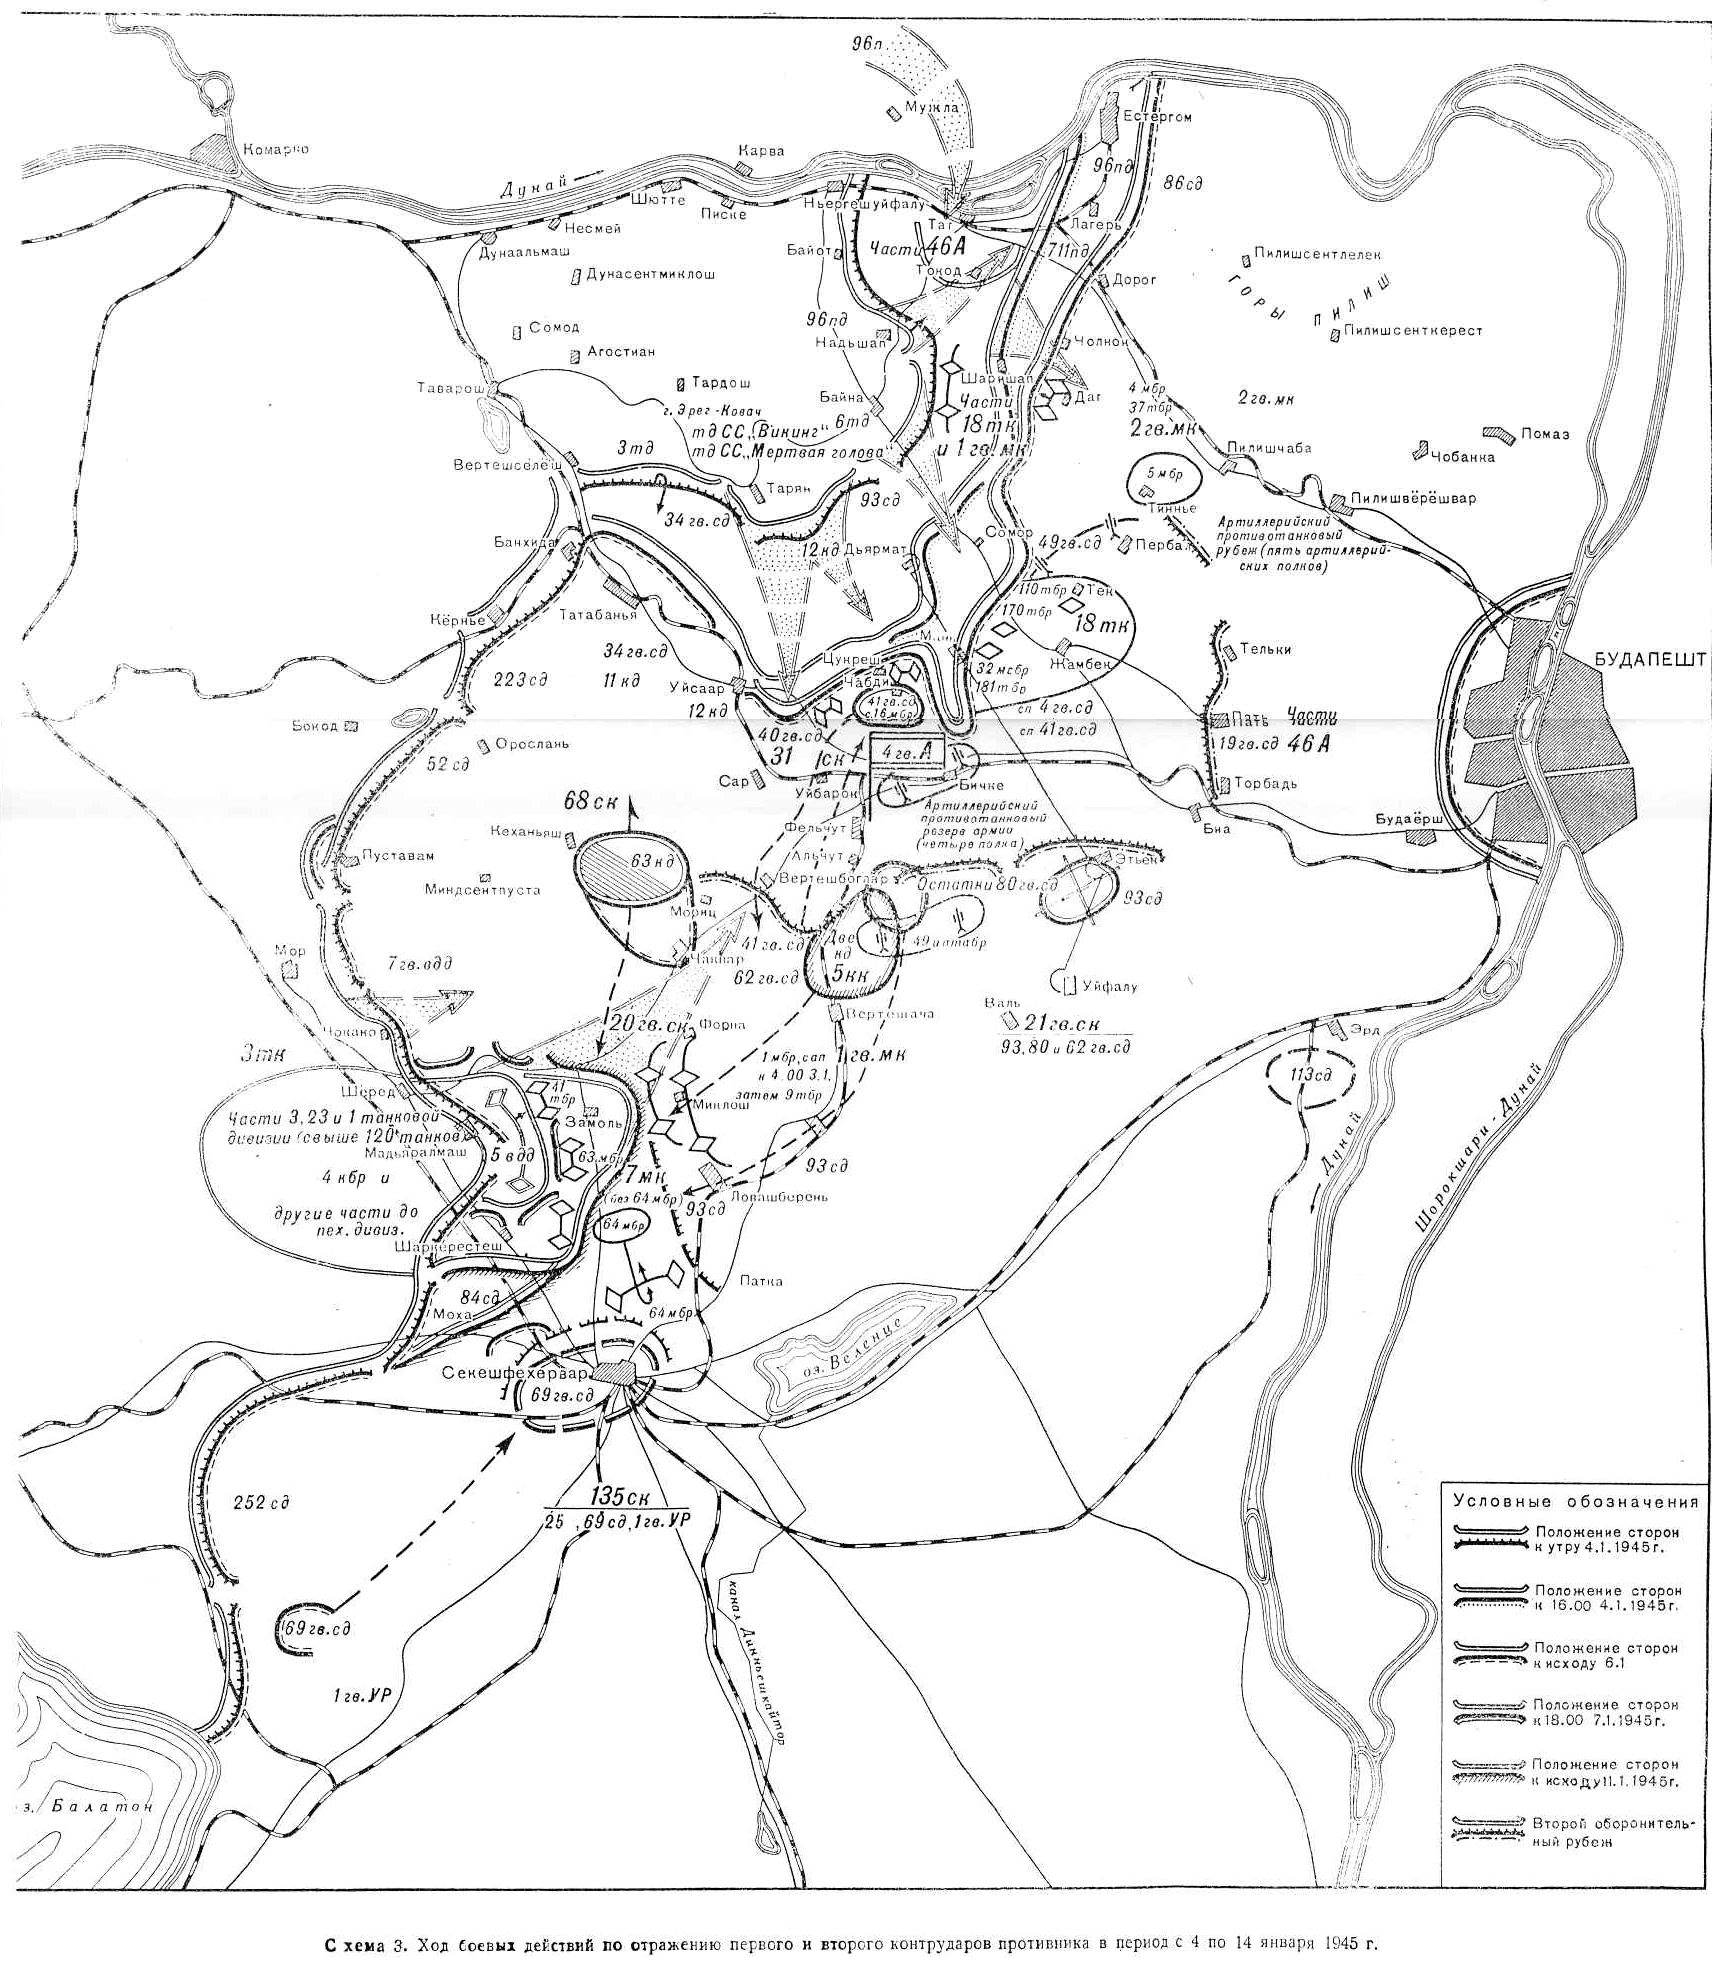 Бои за будапешт январь 1945 года 555 кб